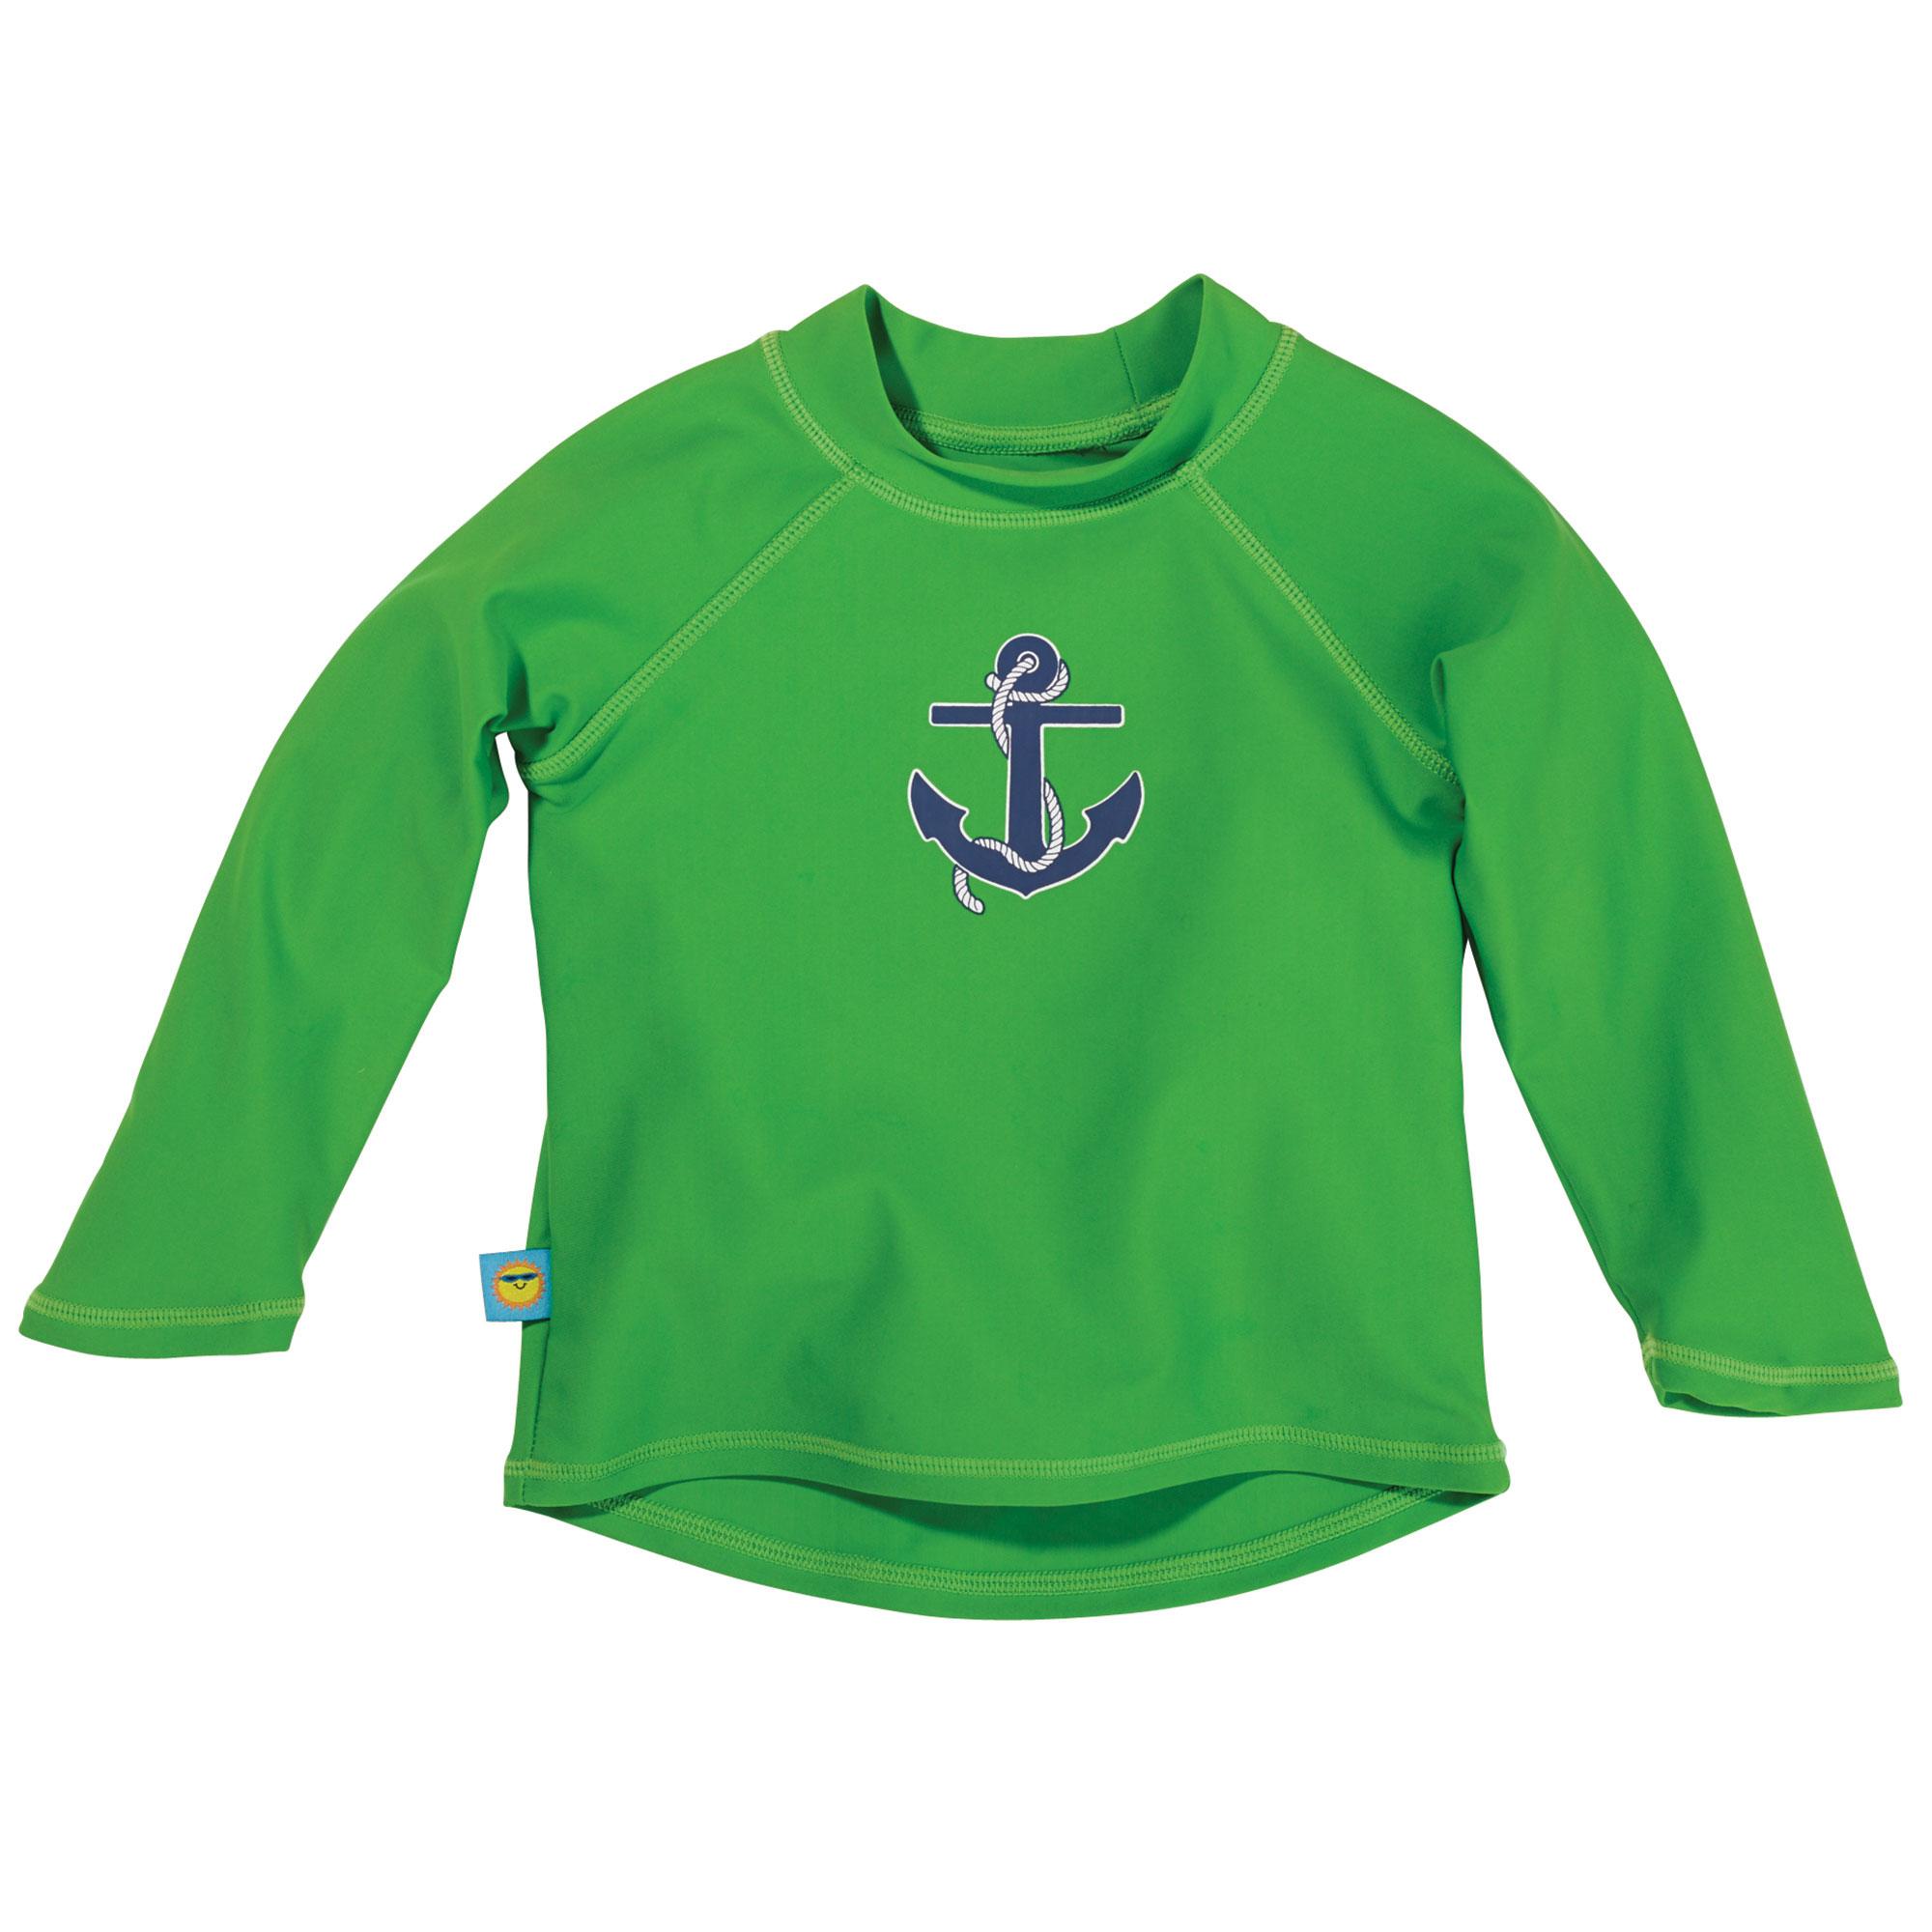 Sun Smarties Boy Rashguard - Green with Anchor Design - Long Sleeve